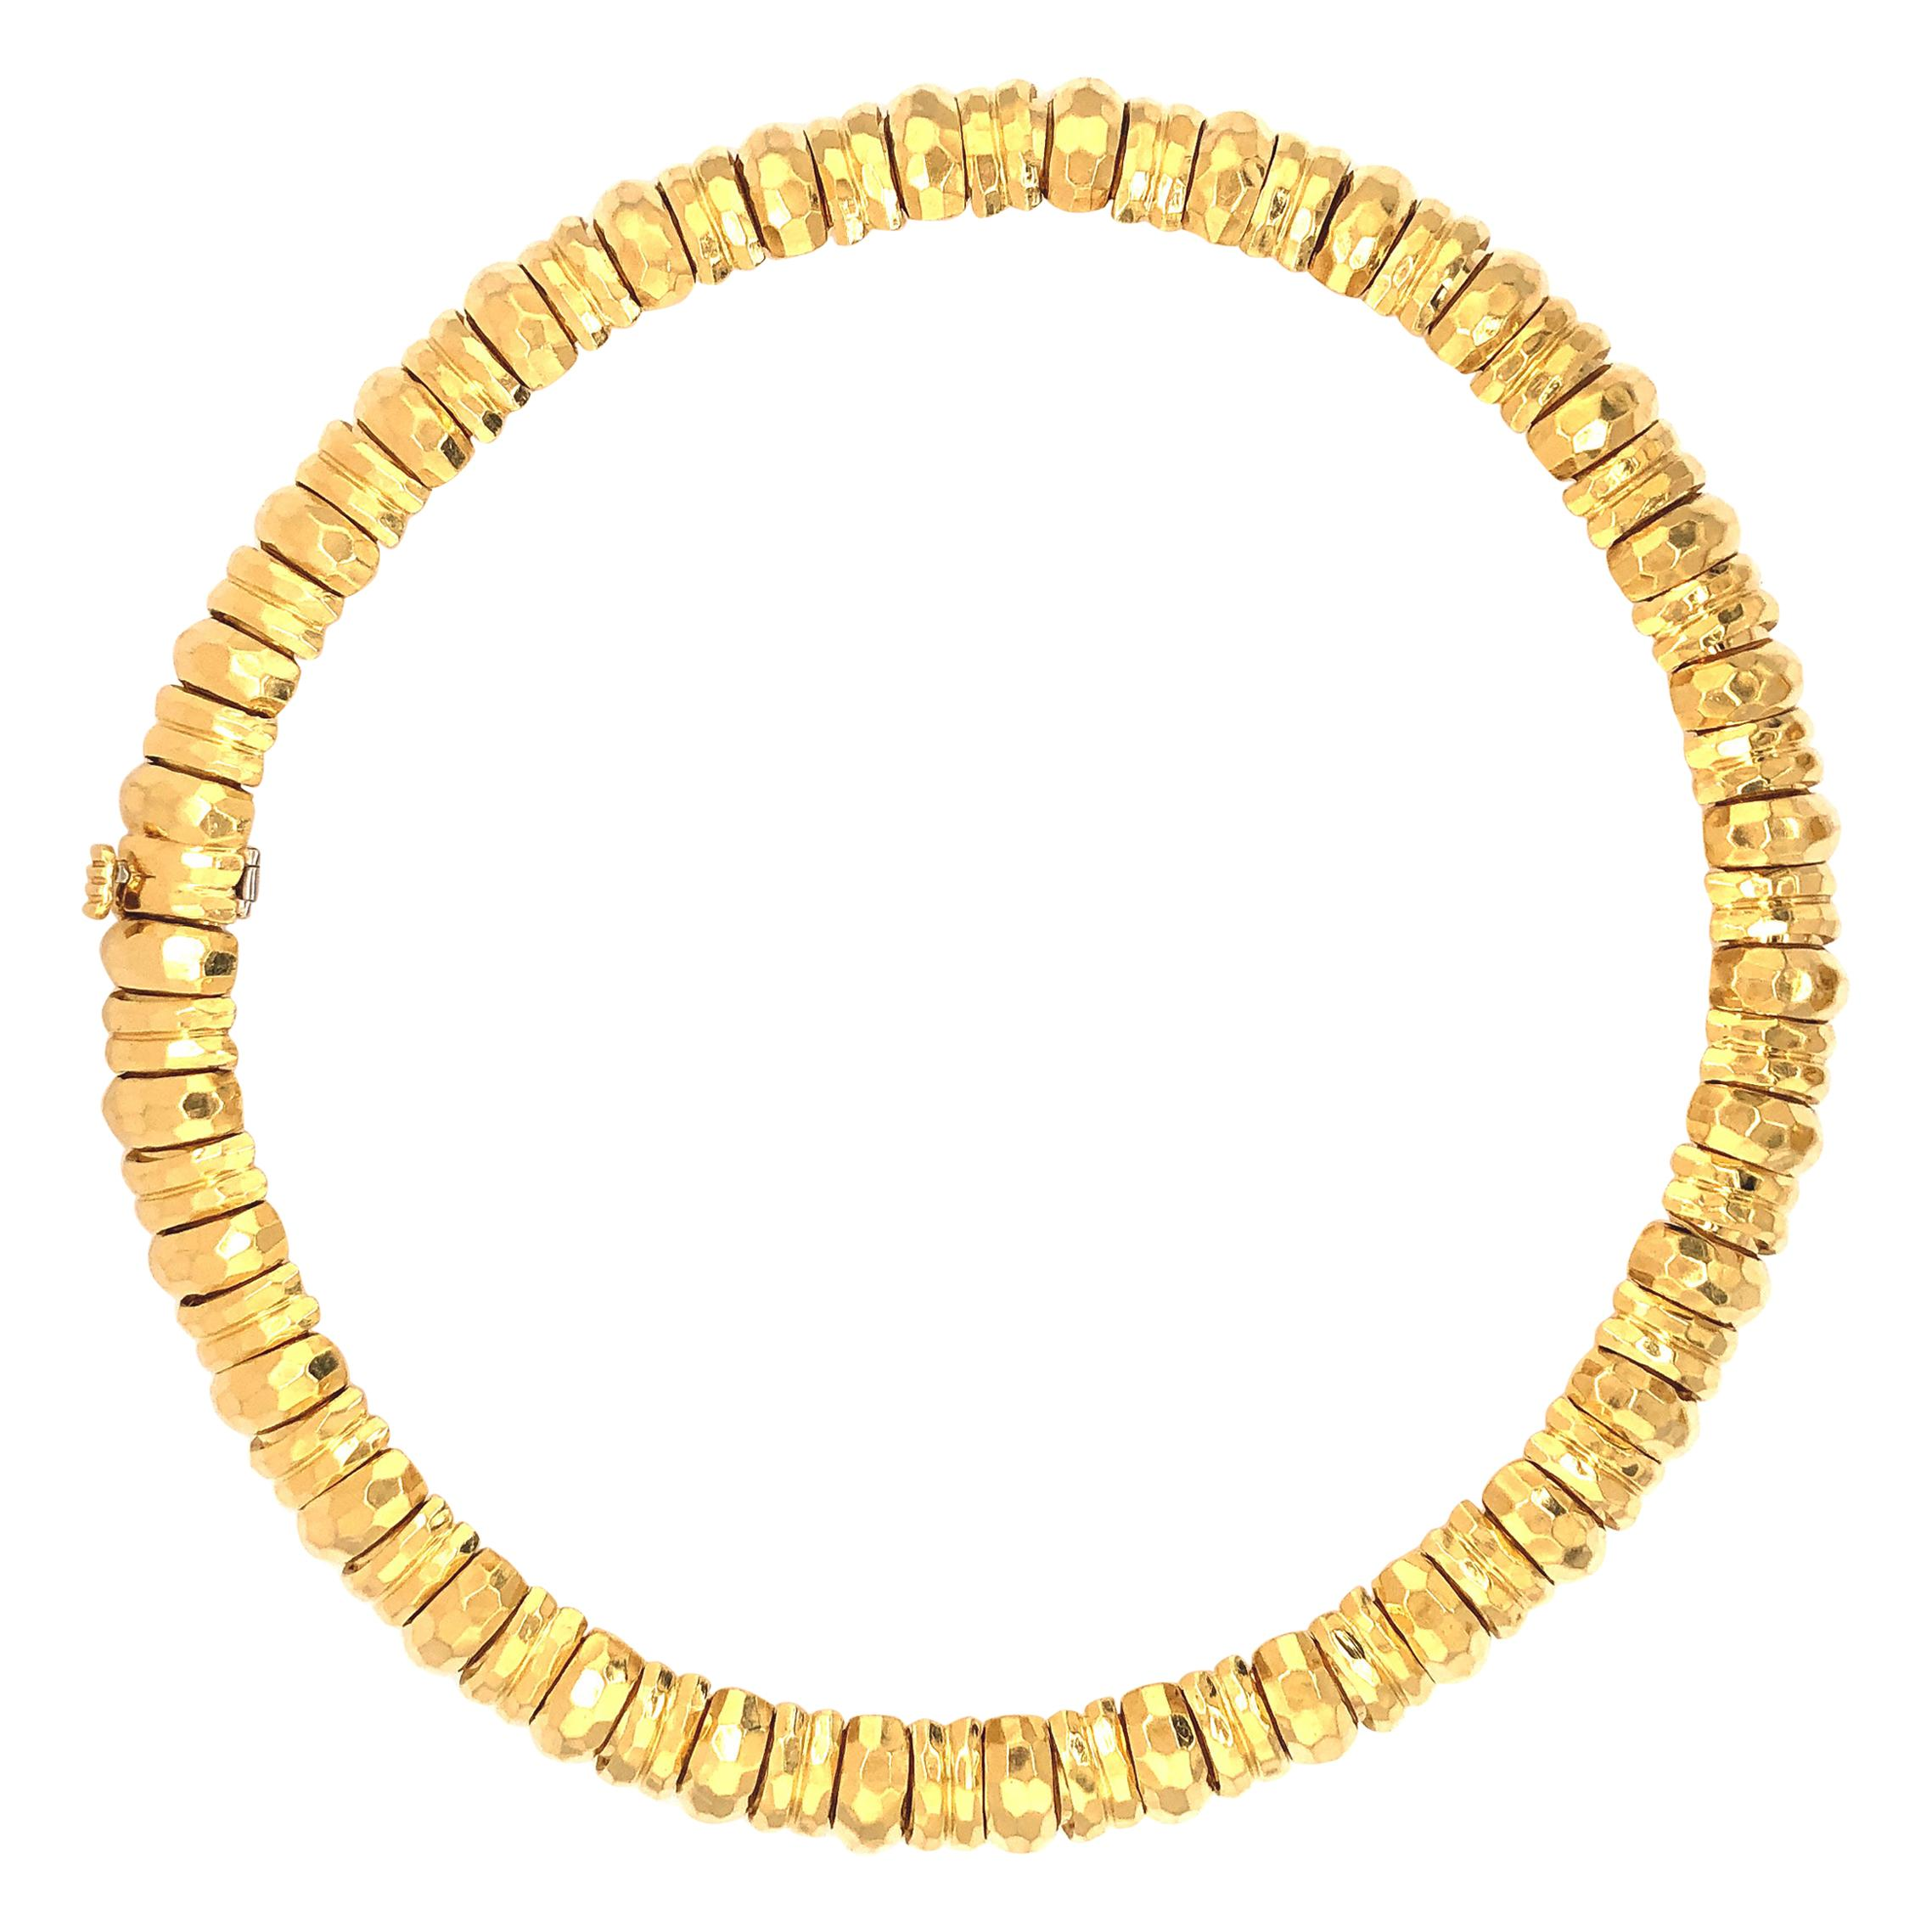 Henry Dunay 18 Karat Yellow Gold Hammer Finished Necklace